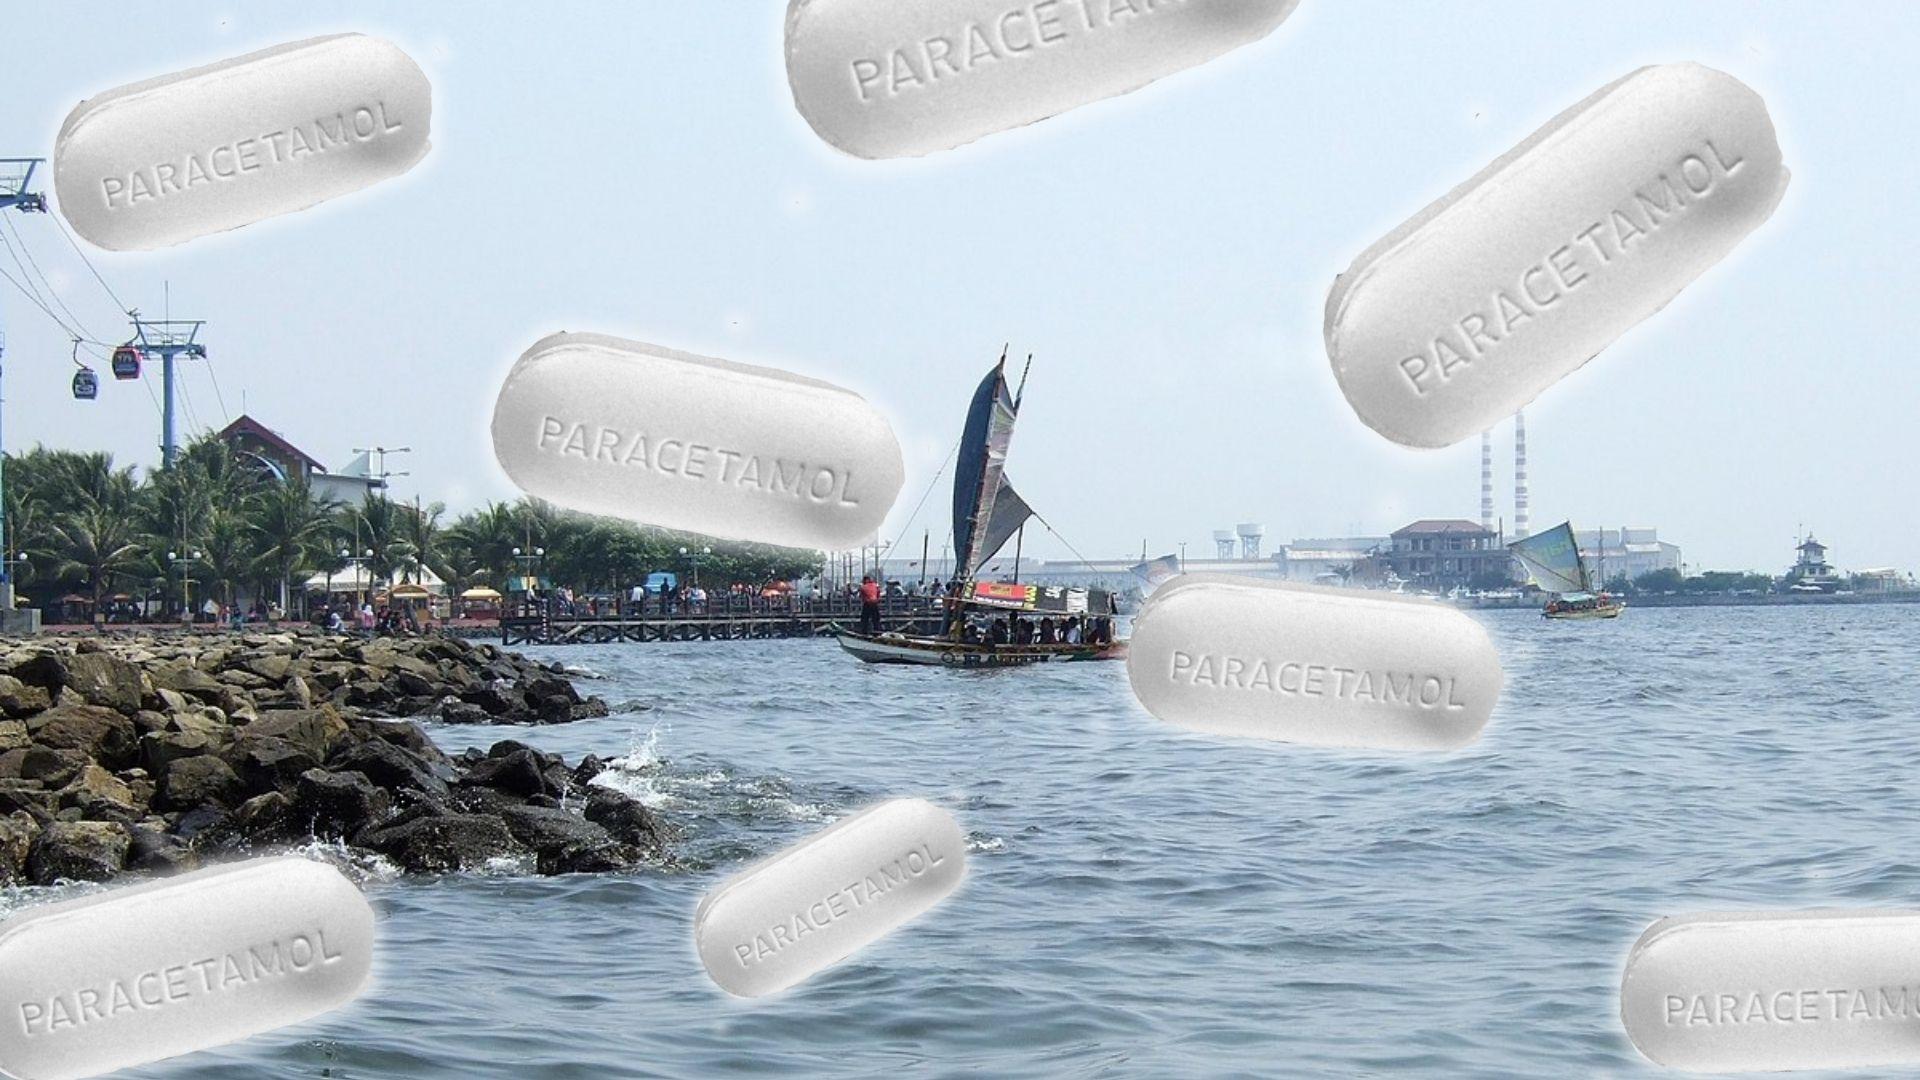 Teluk Jakarta Tercemar Paracetamol, Begini Kata Penelitian!